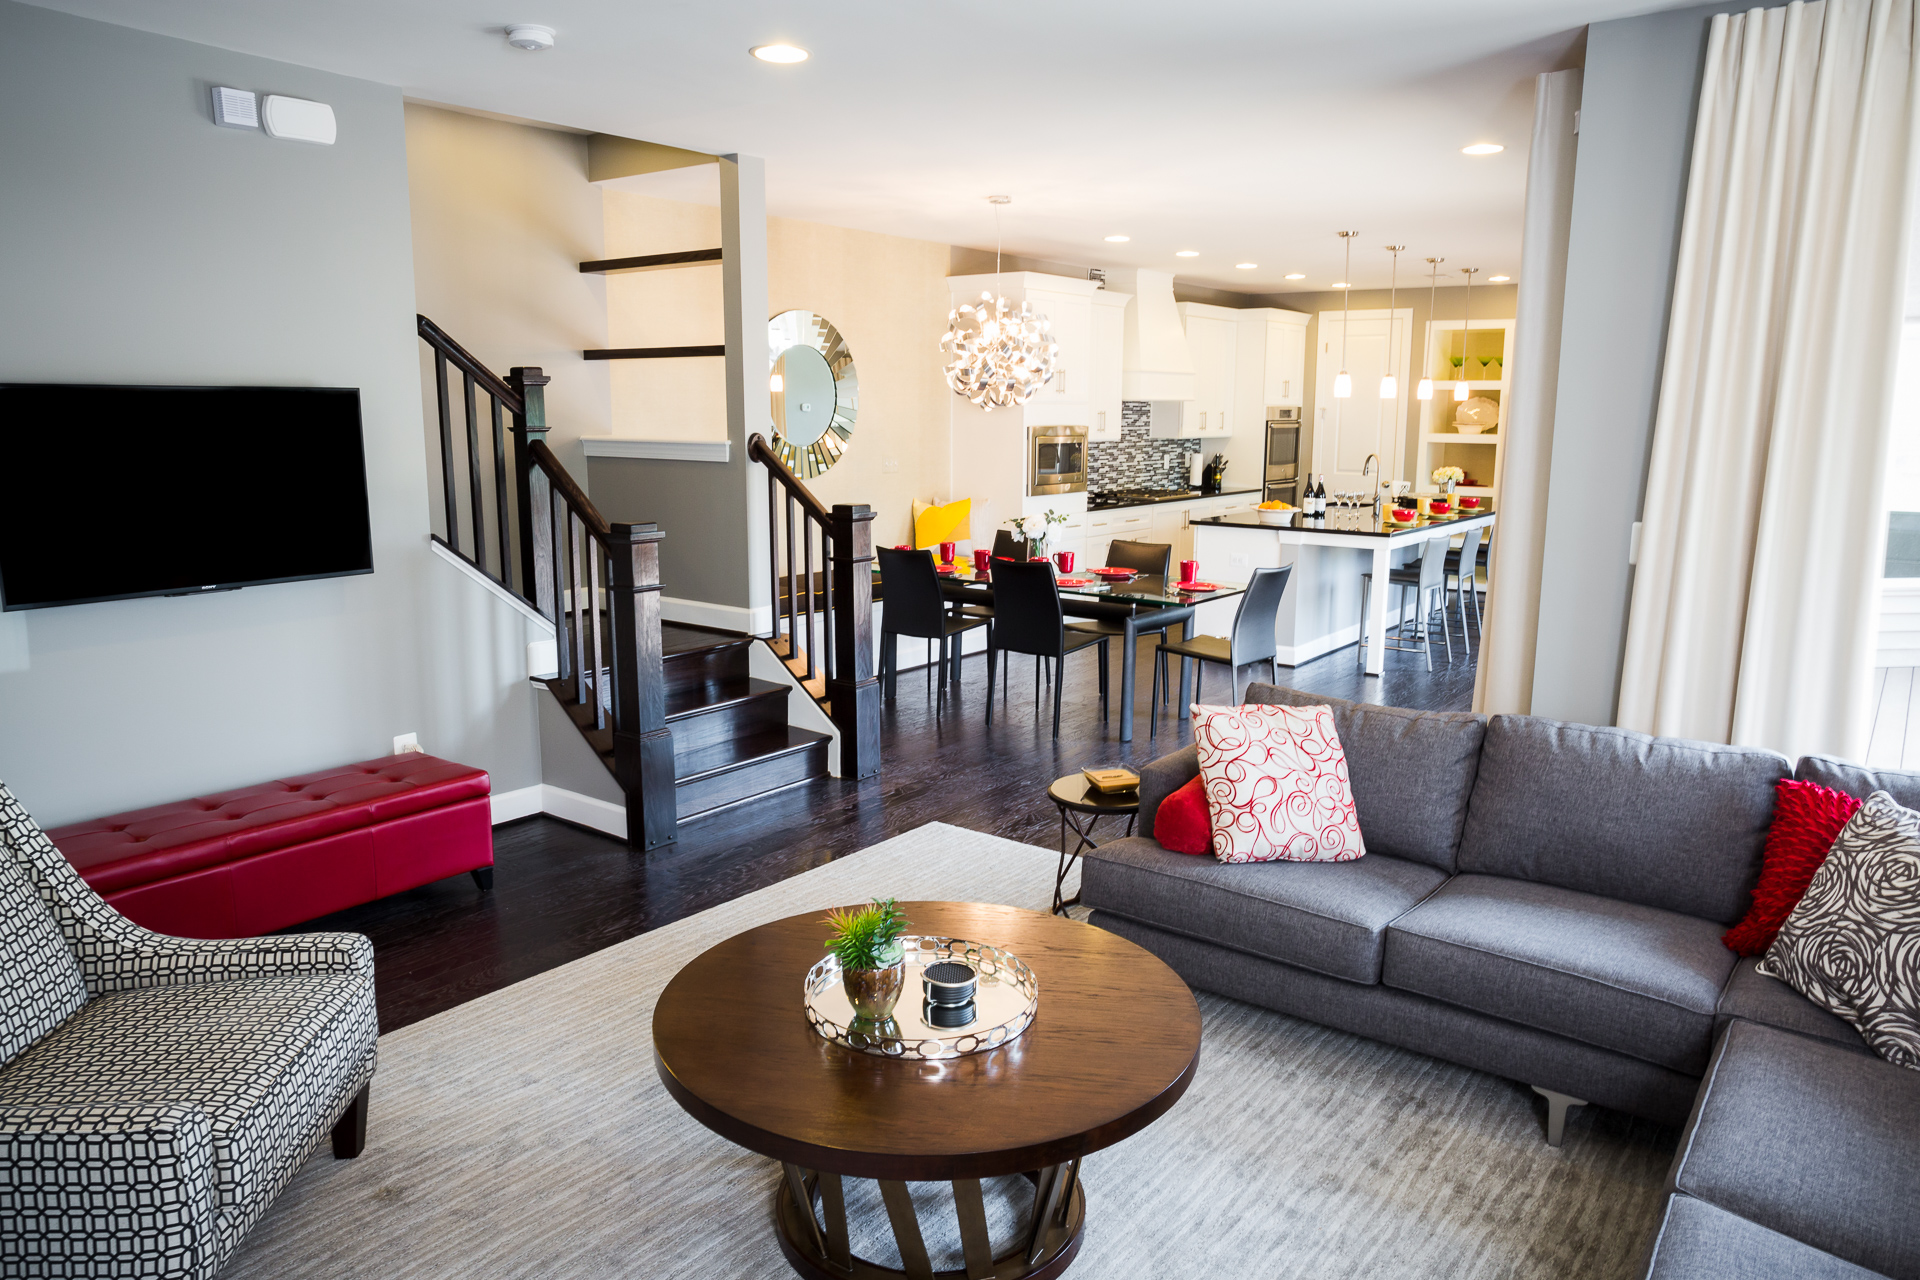 interior design firms northern Virginia,washington dc